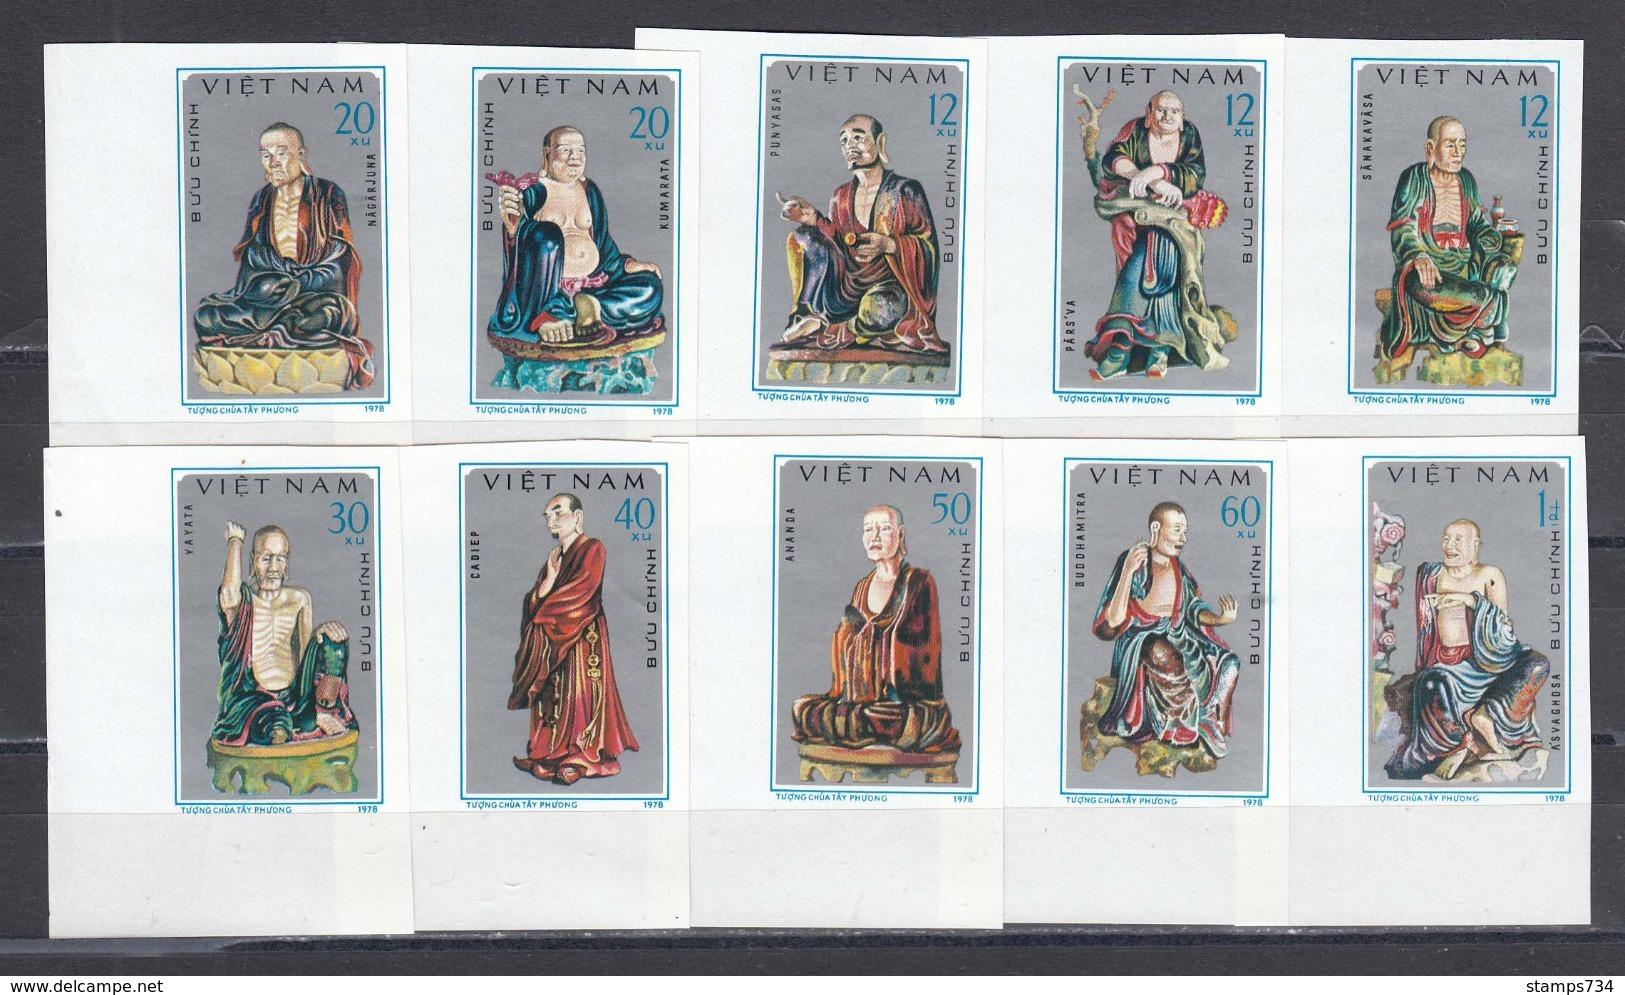 Vietnam 1978 - Sculptures Of The Tay Phuong Pagoda, Mi-Nr. 974/83, Imperf., MNH** - Vietnam